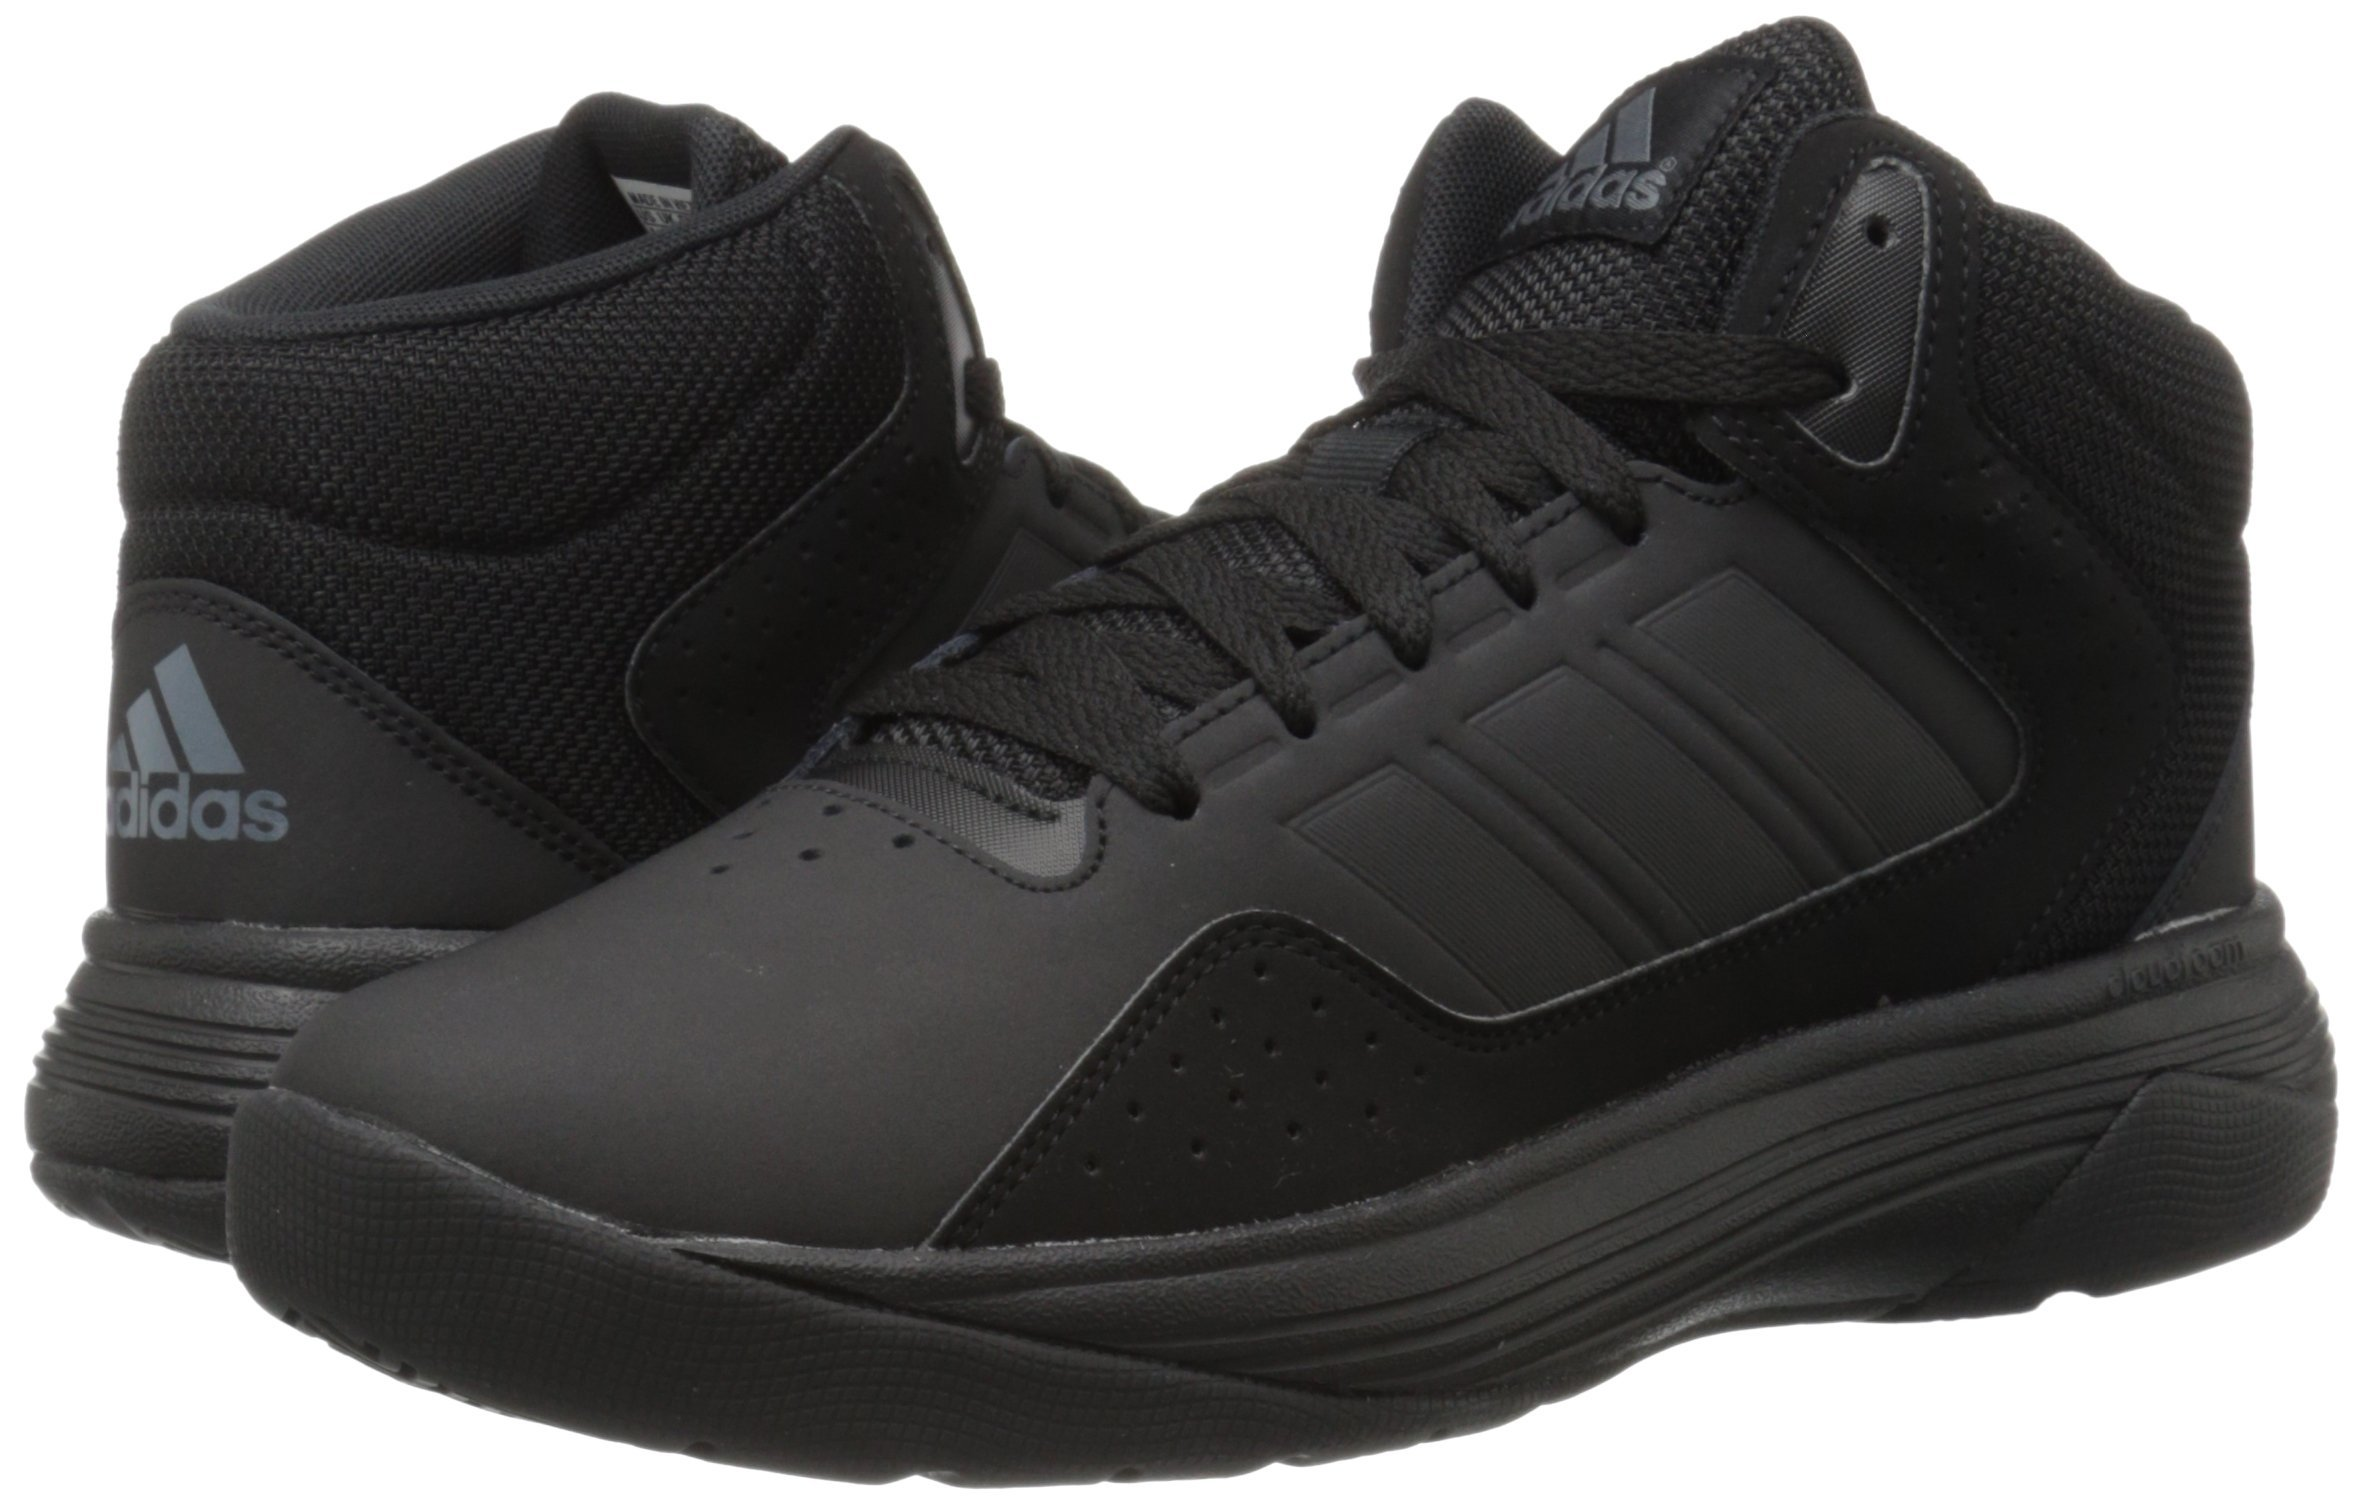 4e31929d839 adidas NEO Men s Cloudfoam Ilation Mid Basketball Shoe